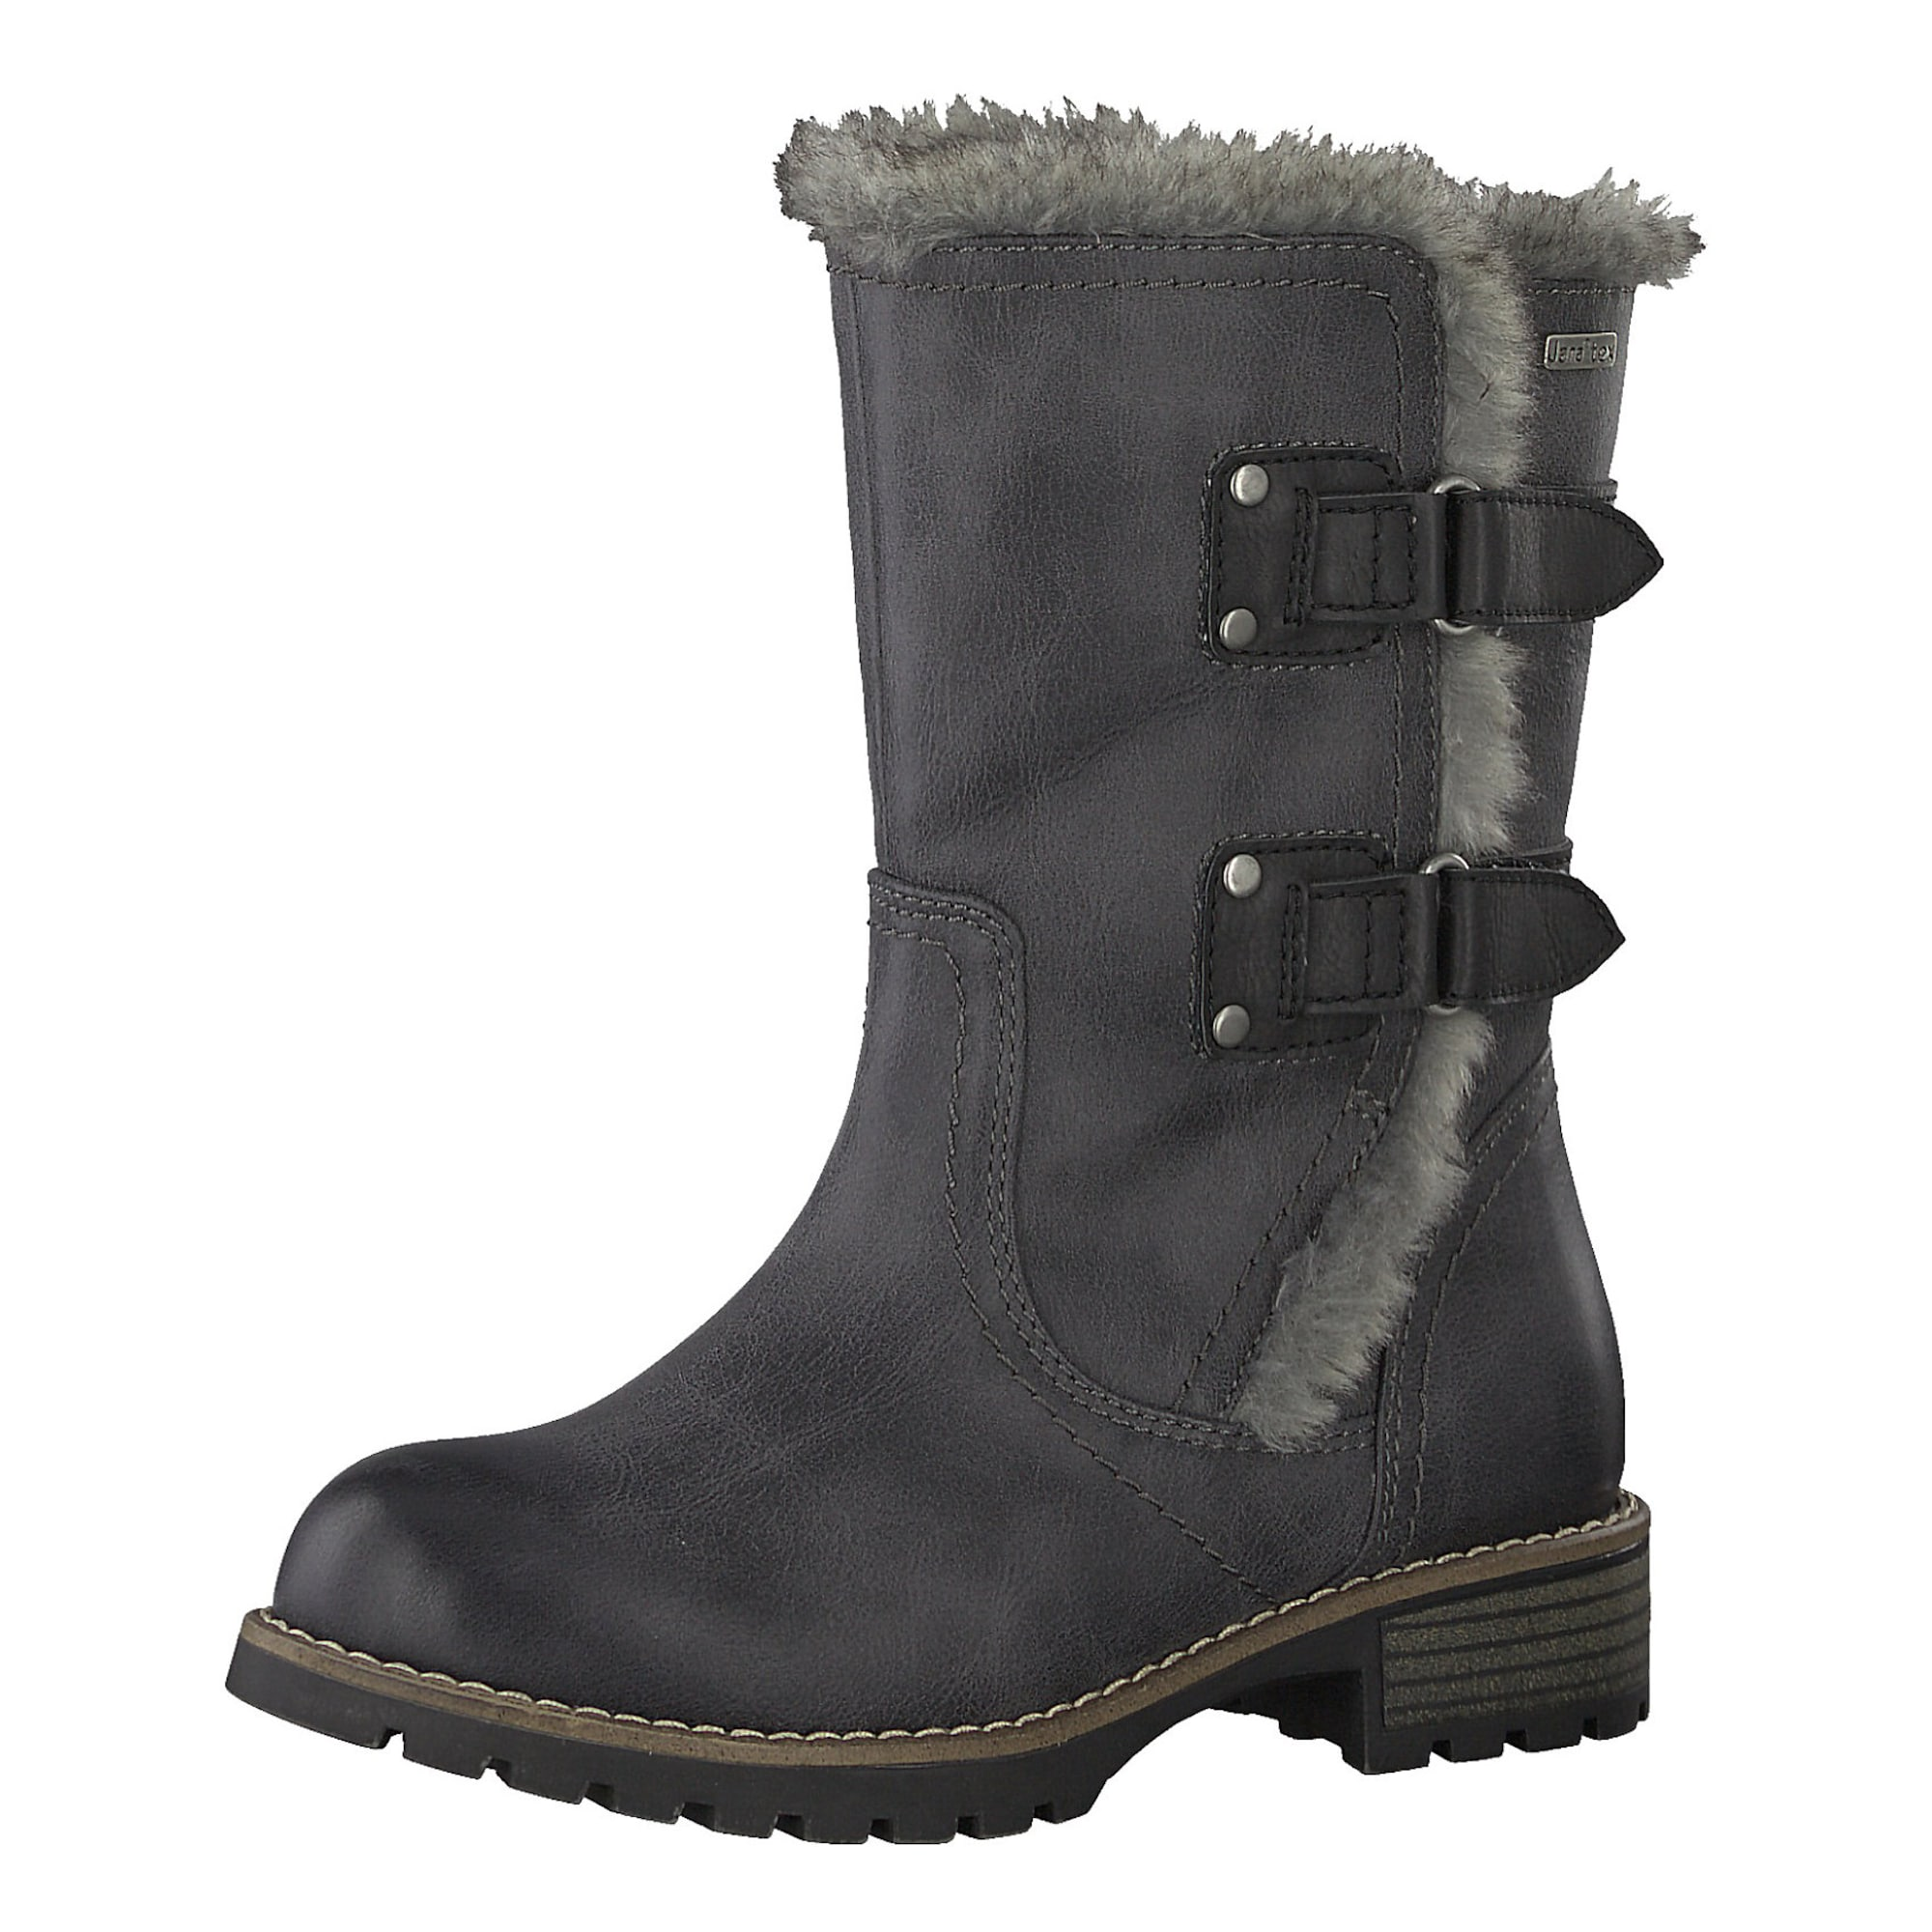 Winterstiefel   Schuhe > Stiefel > Winterstiefel   JANA